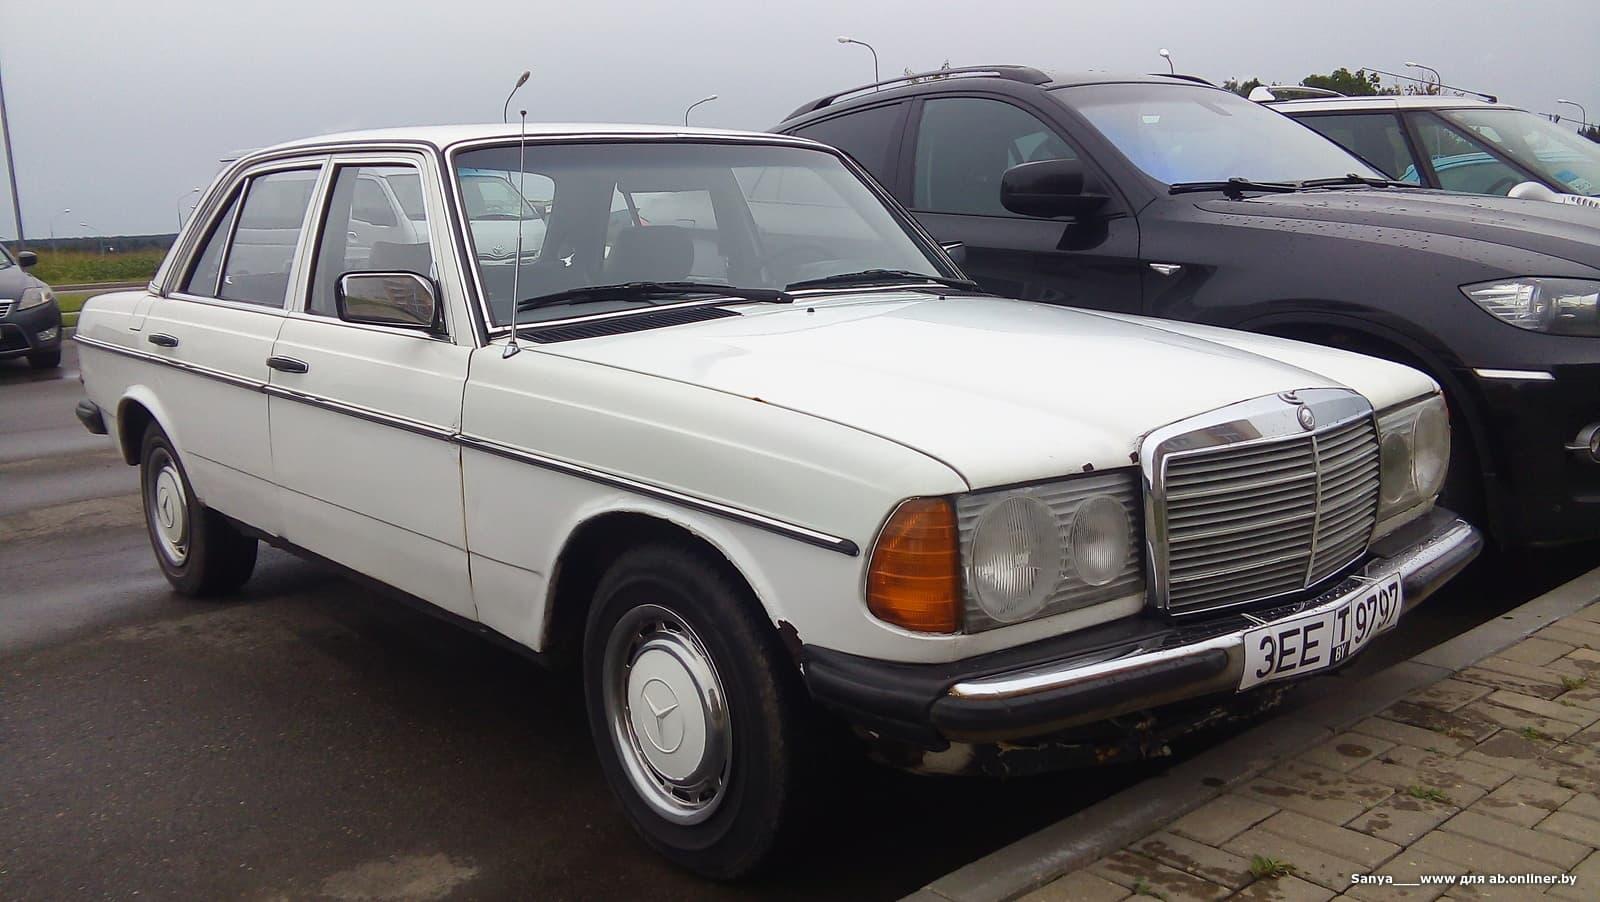 Mercedes-Benz E200 W 123